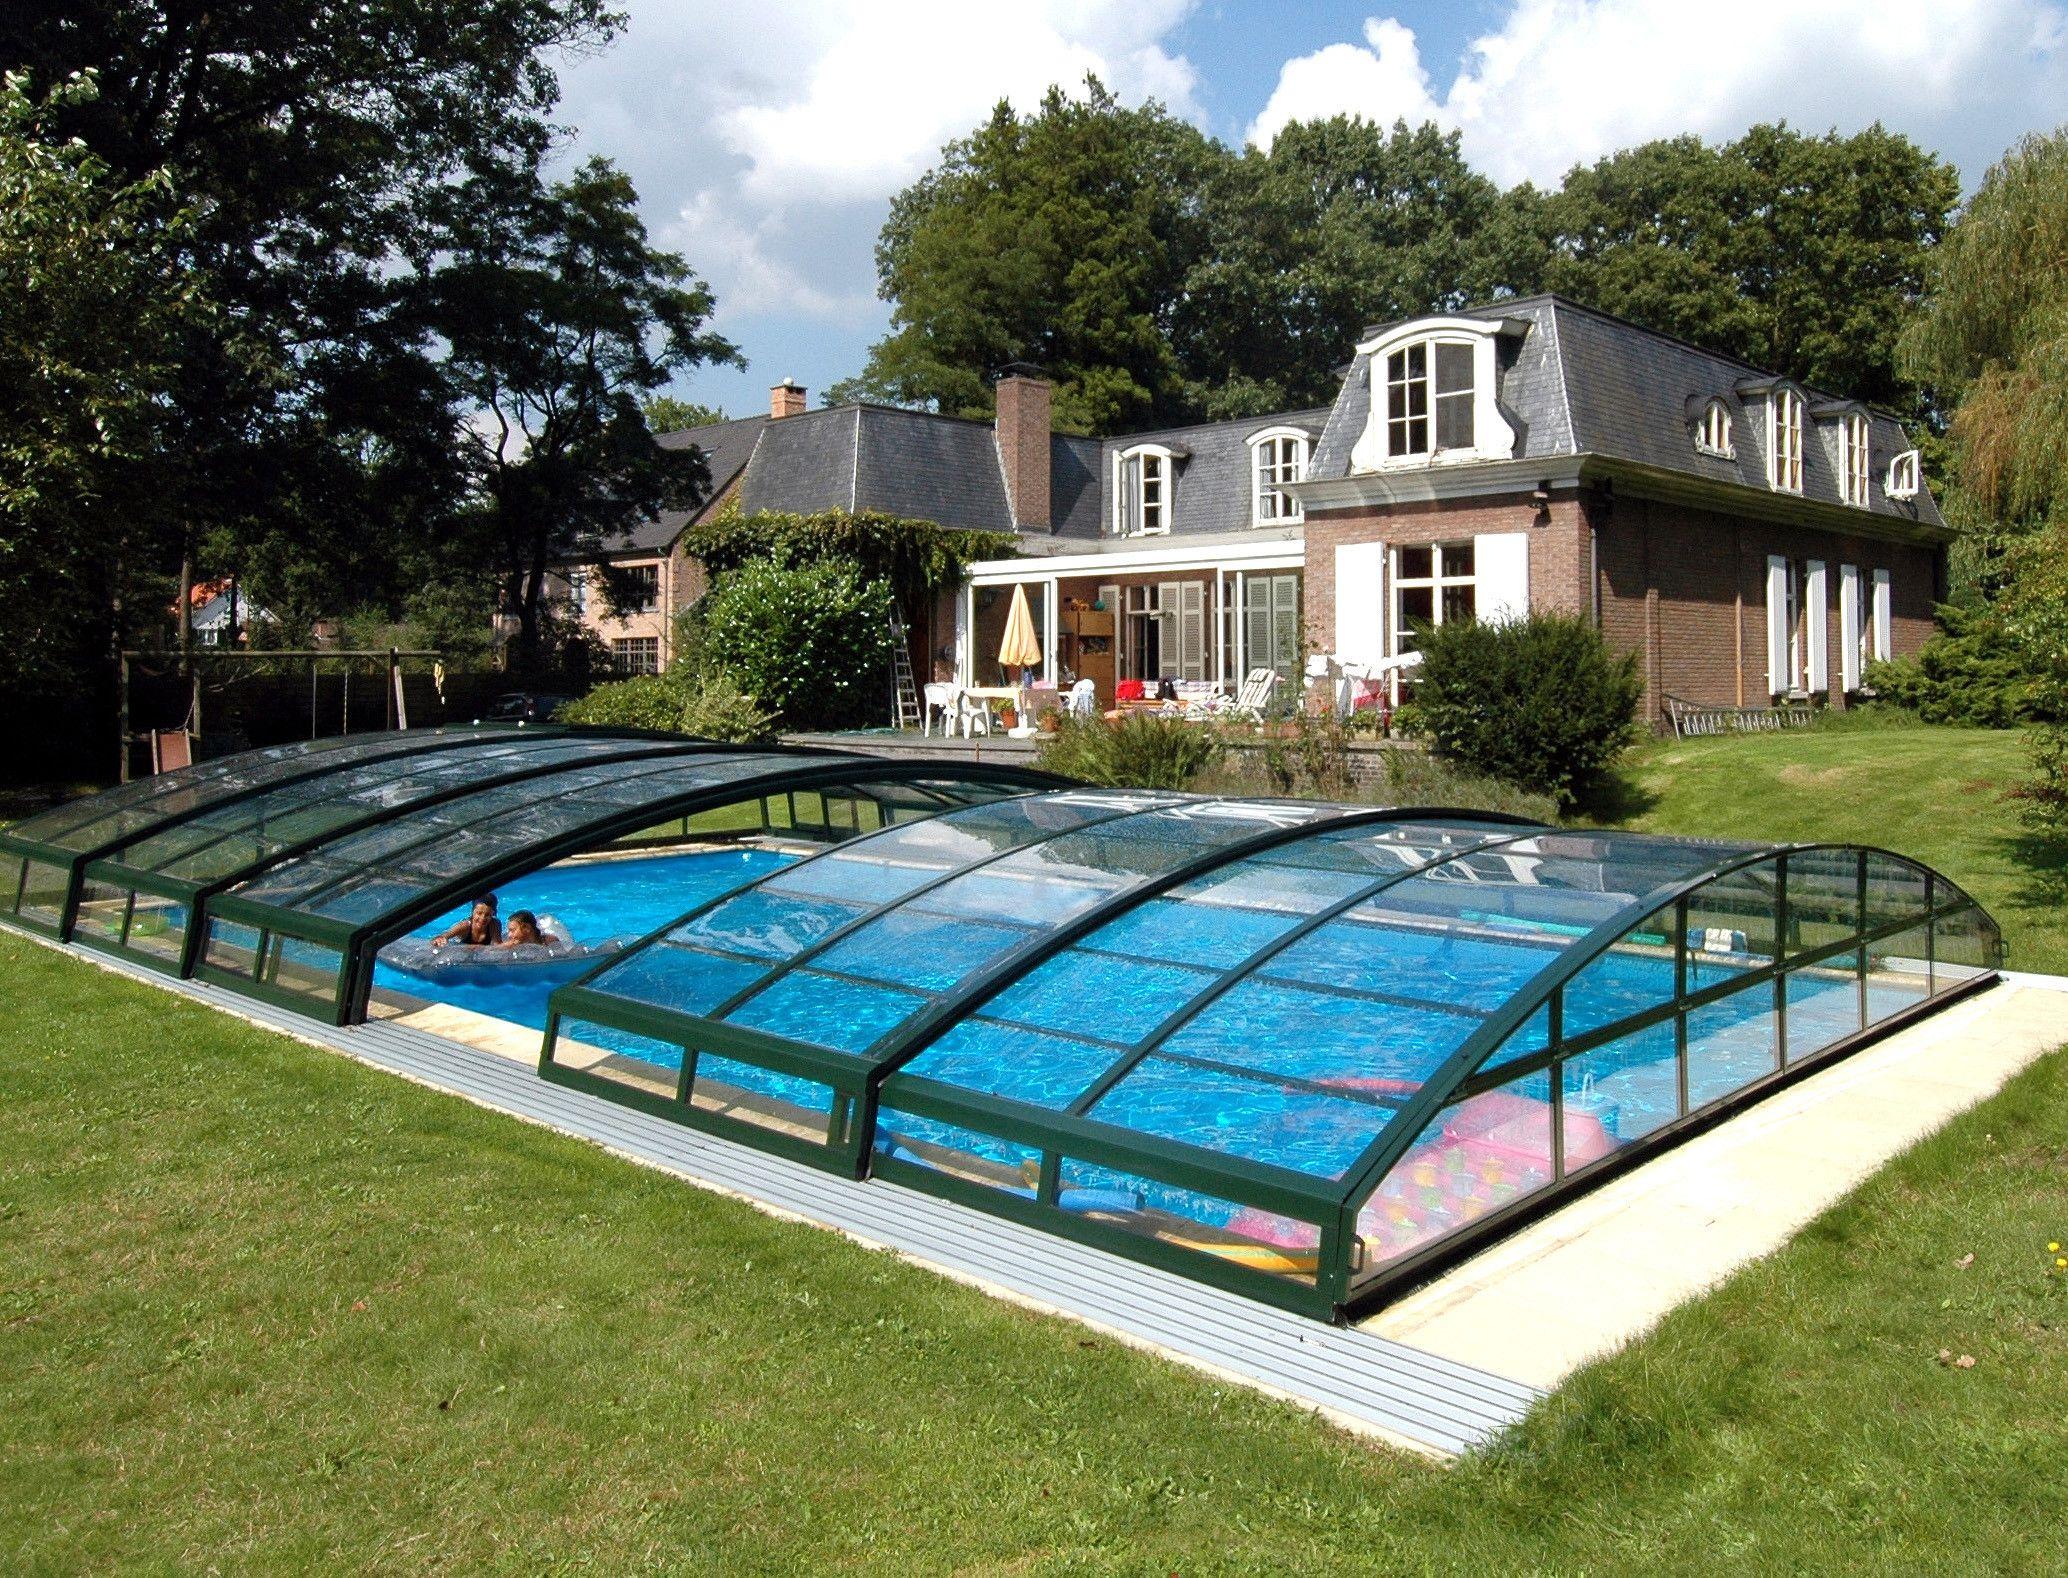 Imperia enclosure diy pool heater cheap pool pool